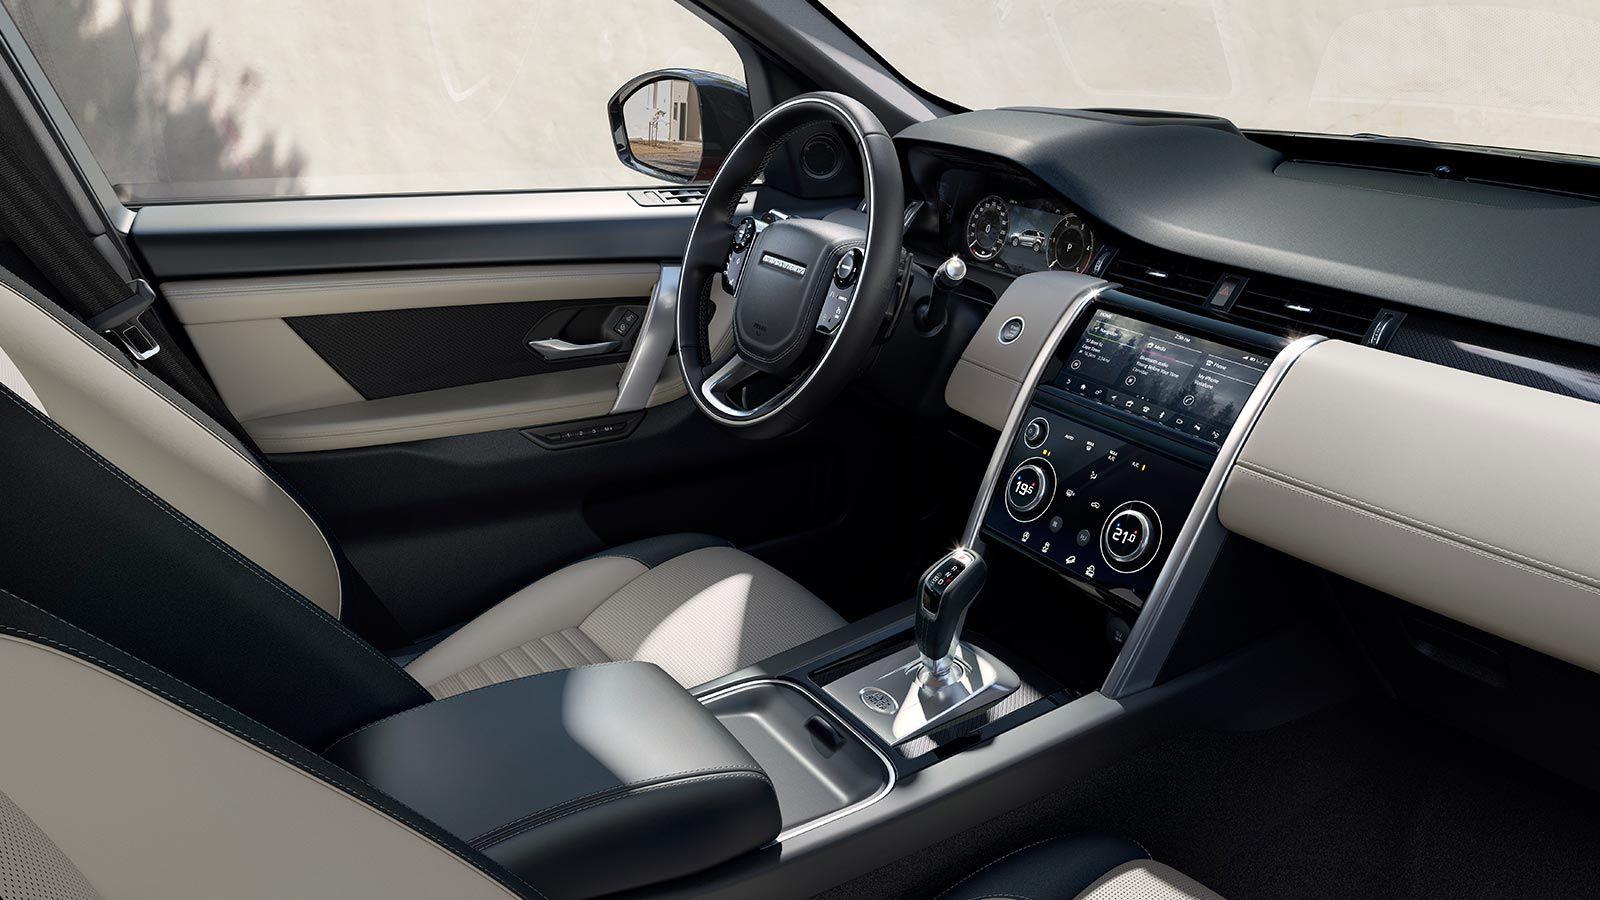 Land Rover Discovery Sport 2020 precio en México Luce como un modelo más completo, funcional y tecnológico